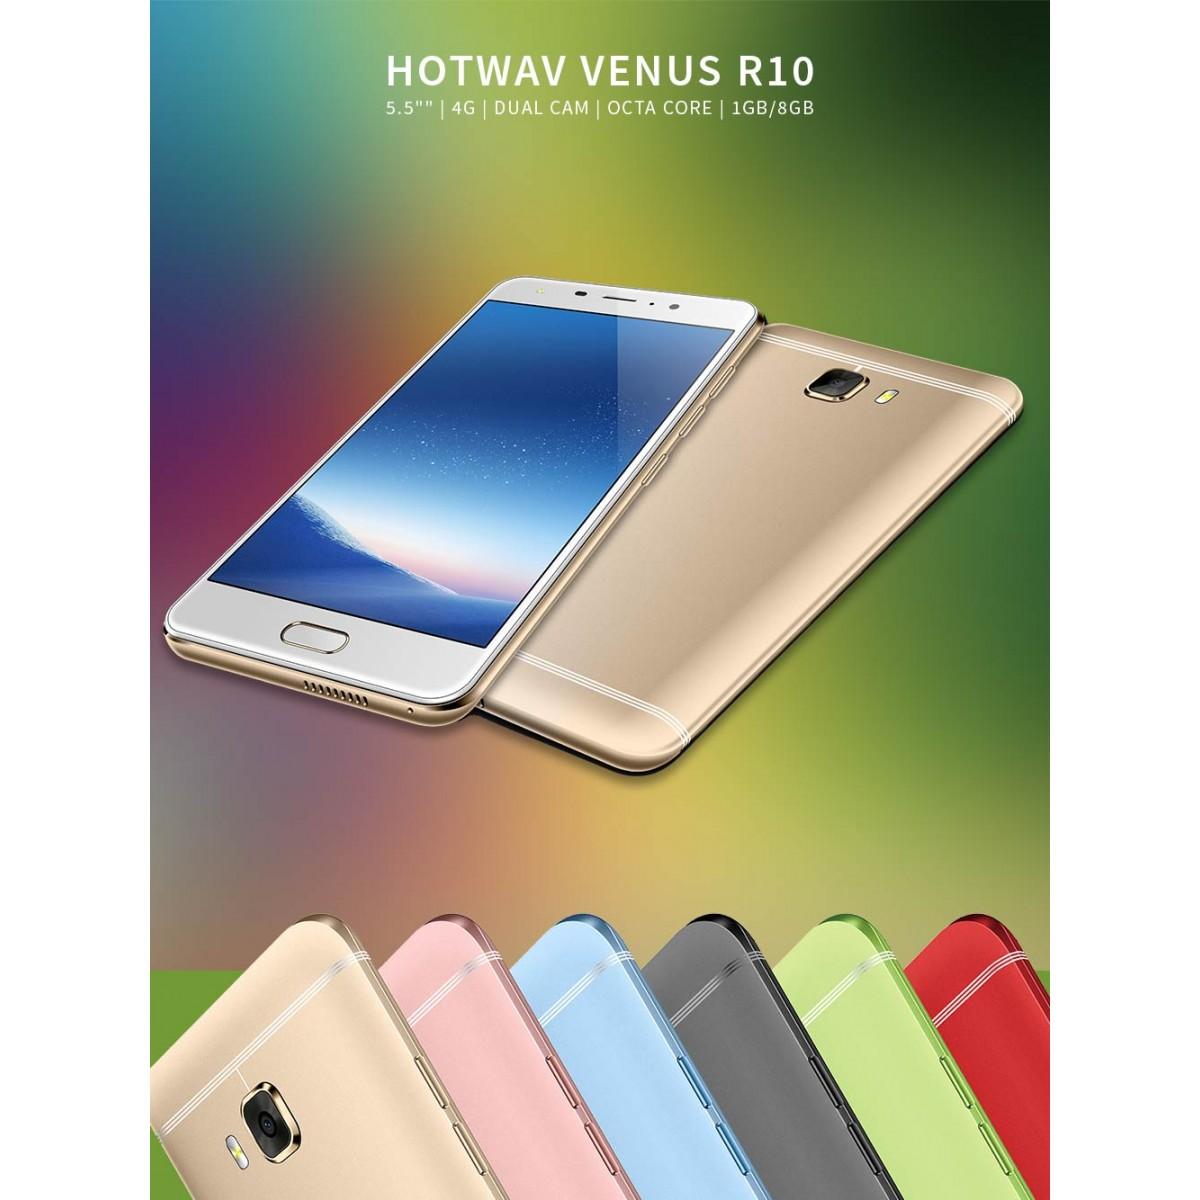 Hotwav Venus R10 - Android Phones - Mobile Phones - Electronics World